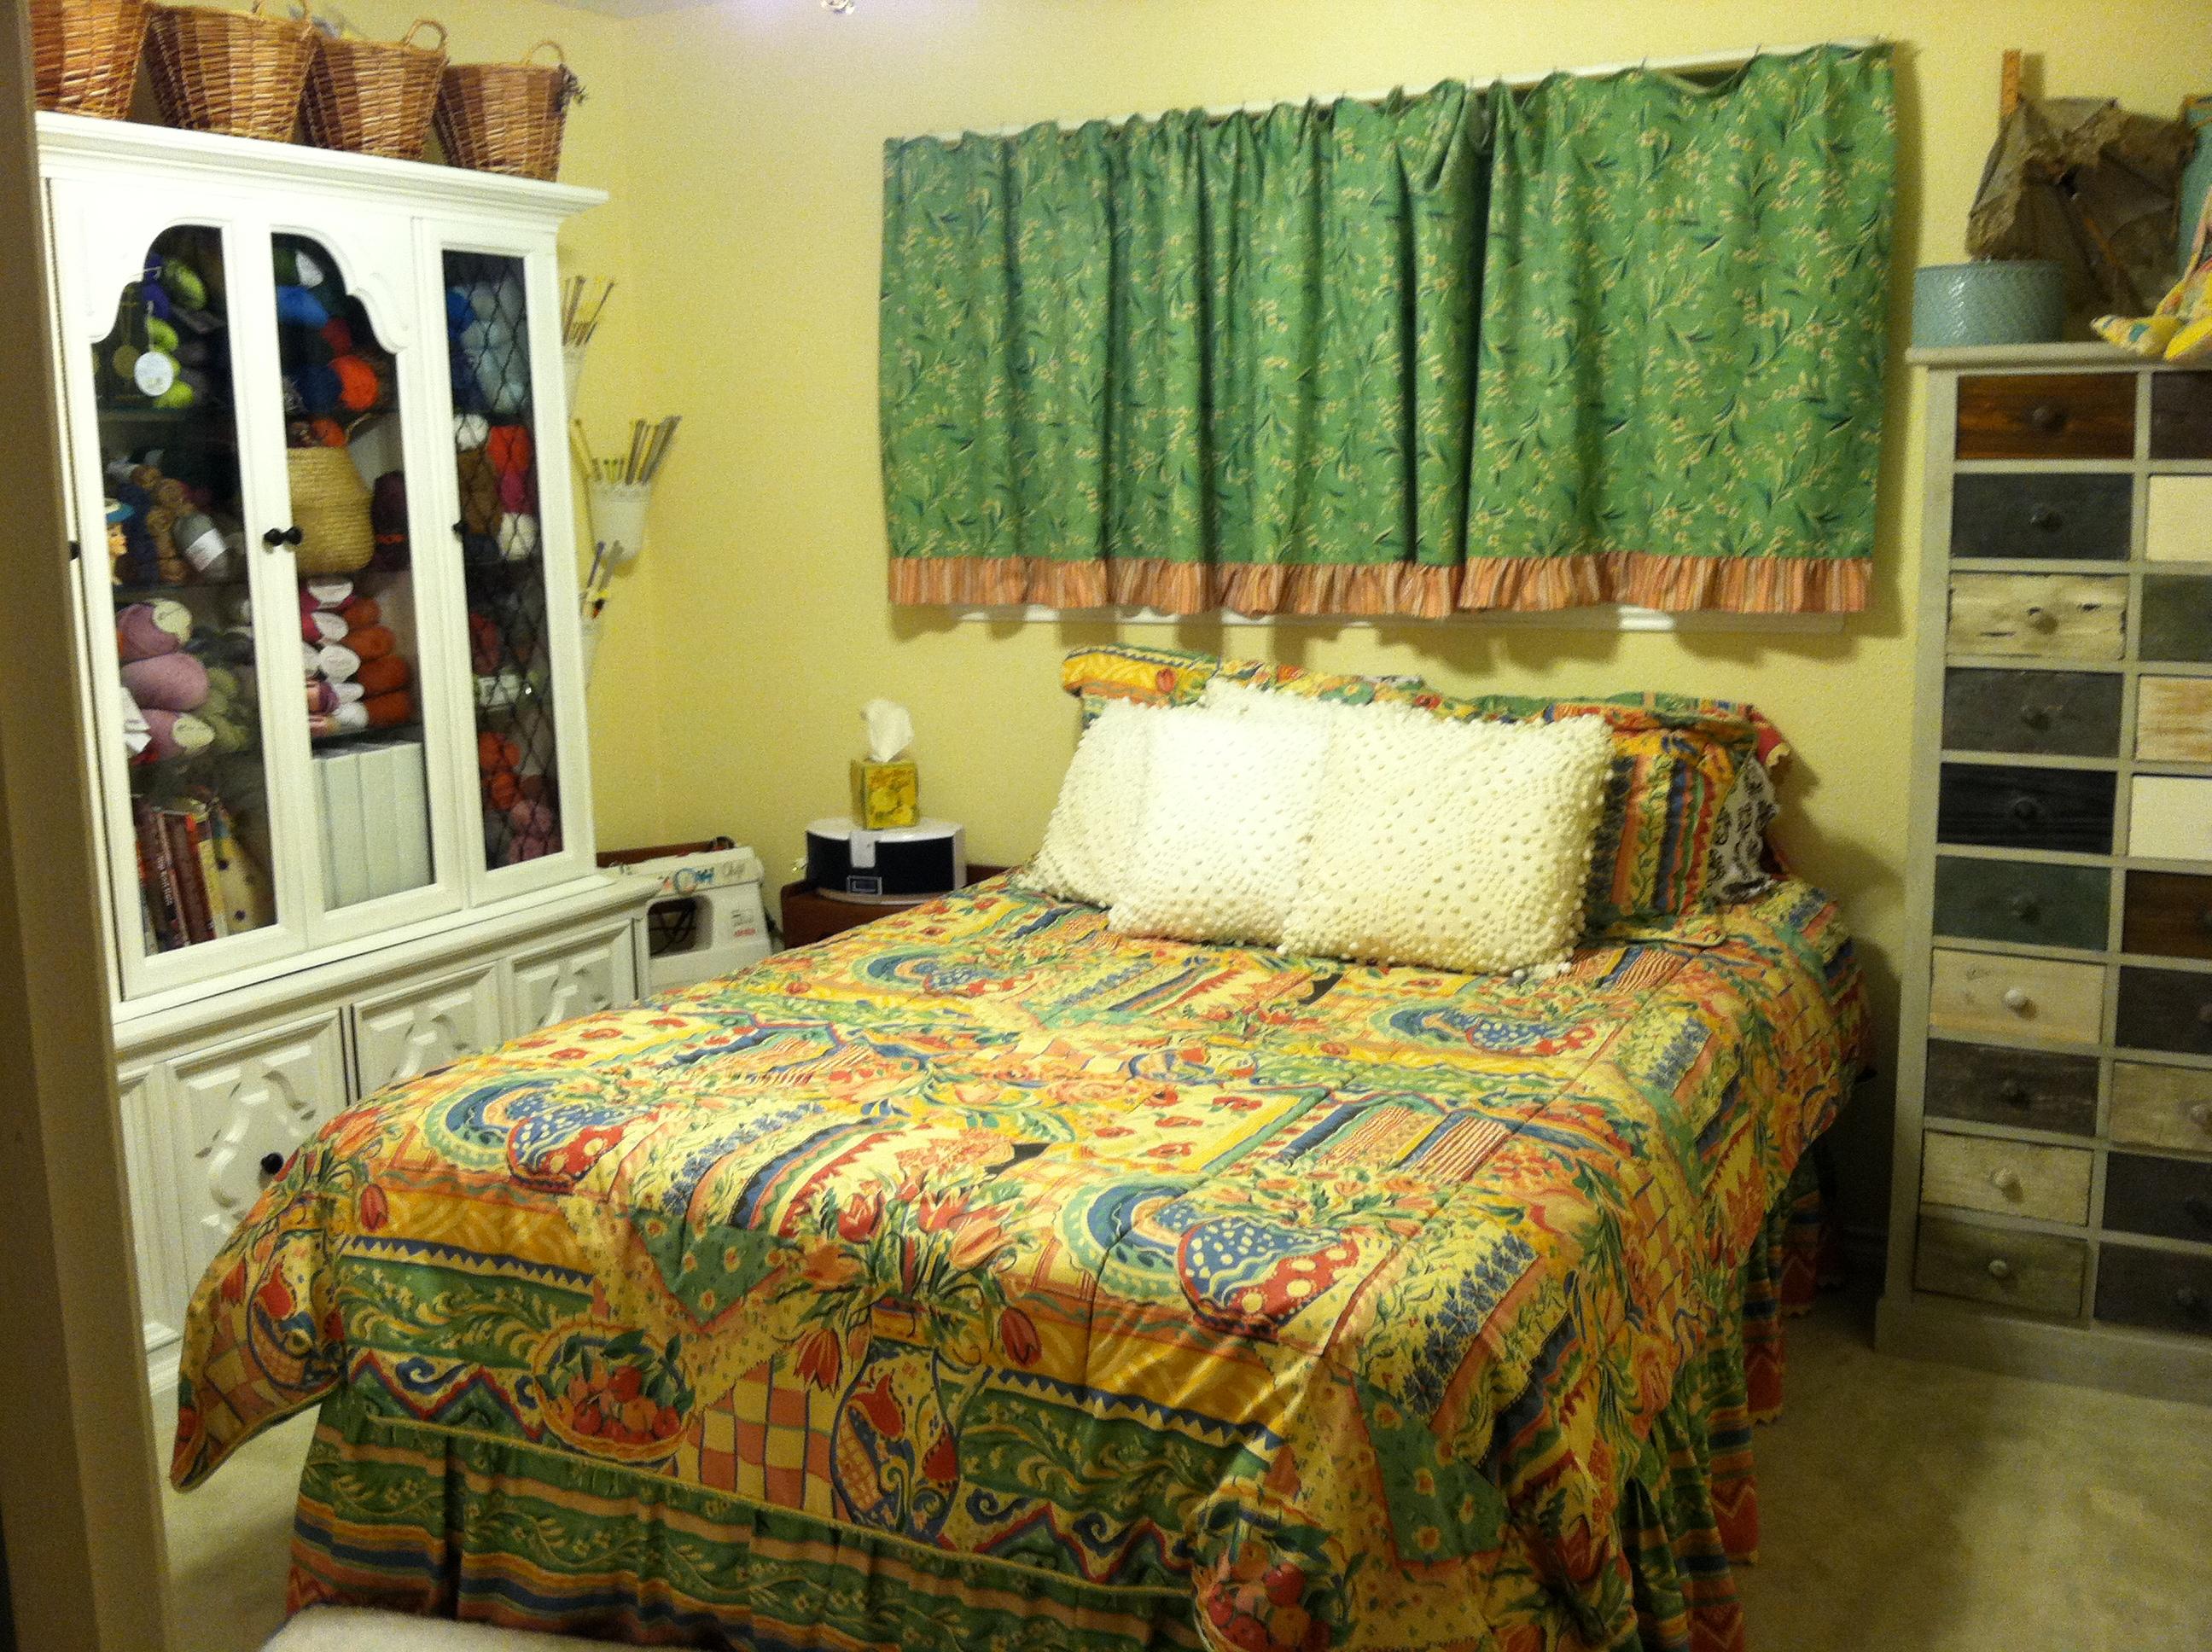 Tags: Cabinet, Craft Room, Crafts, Knitting Room, Yarn Stash